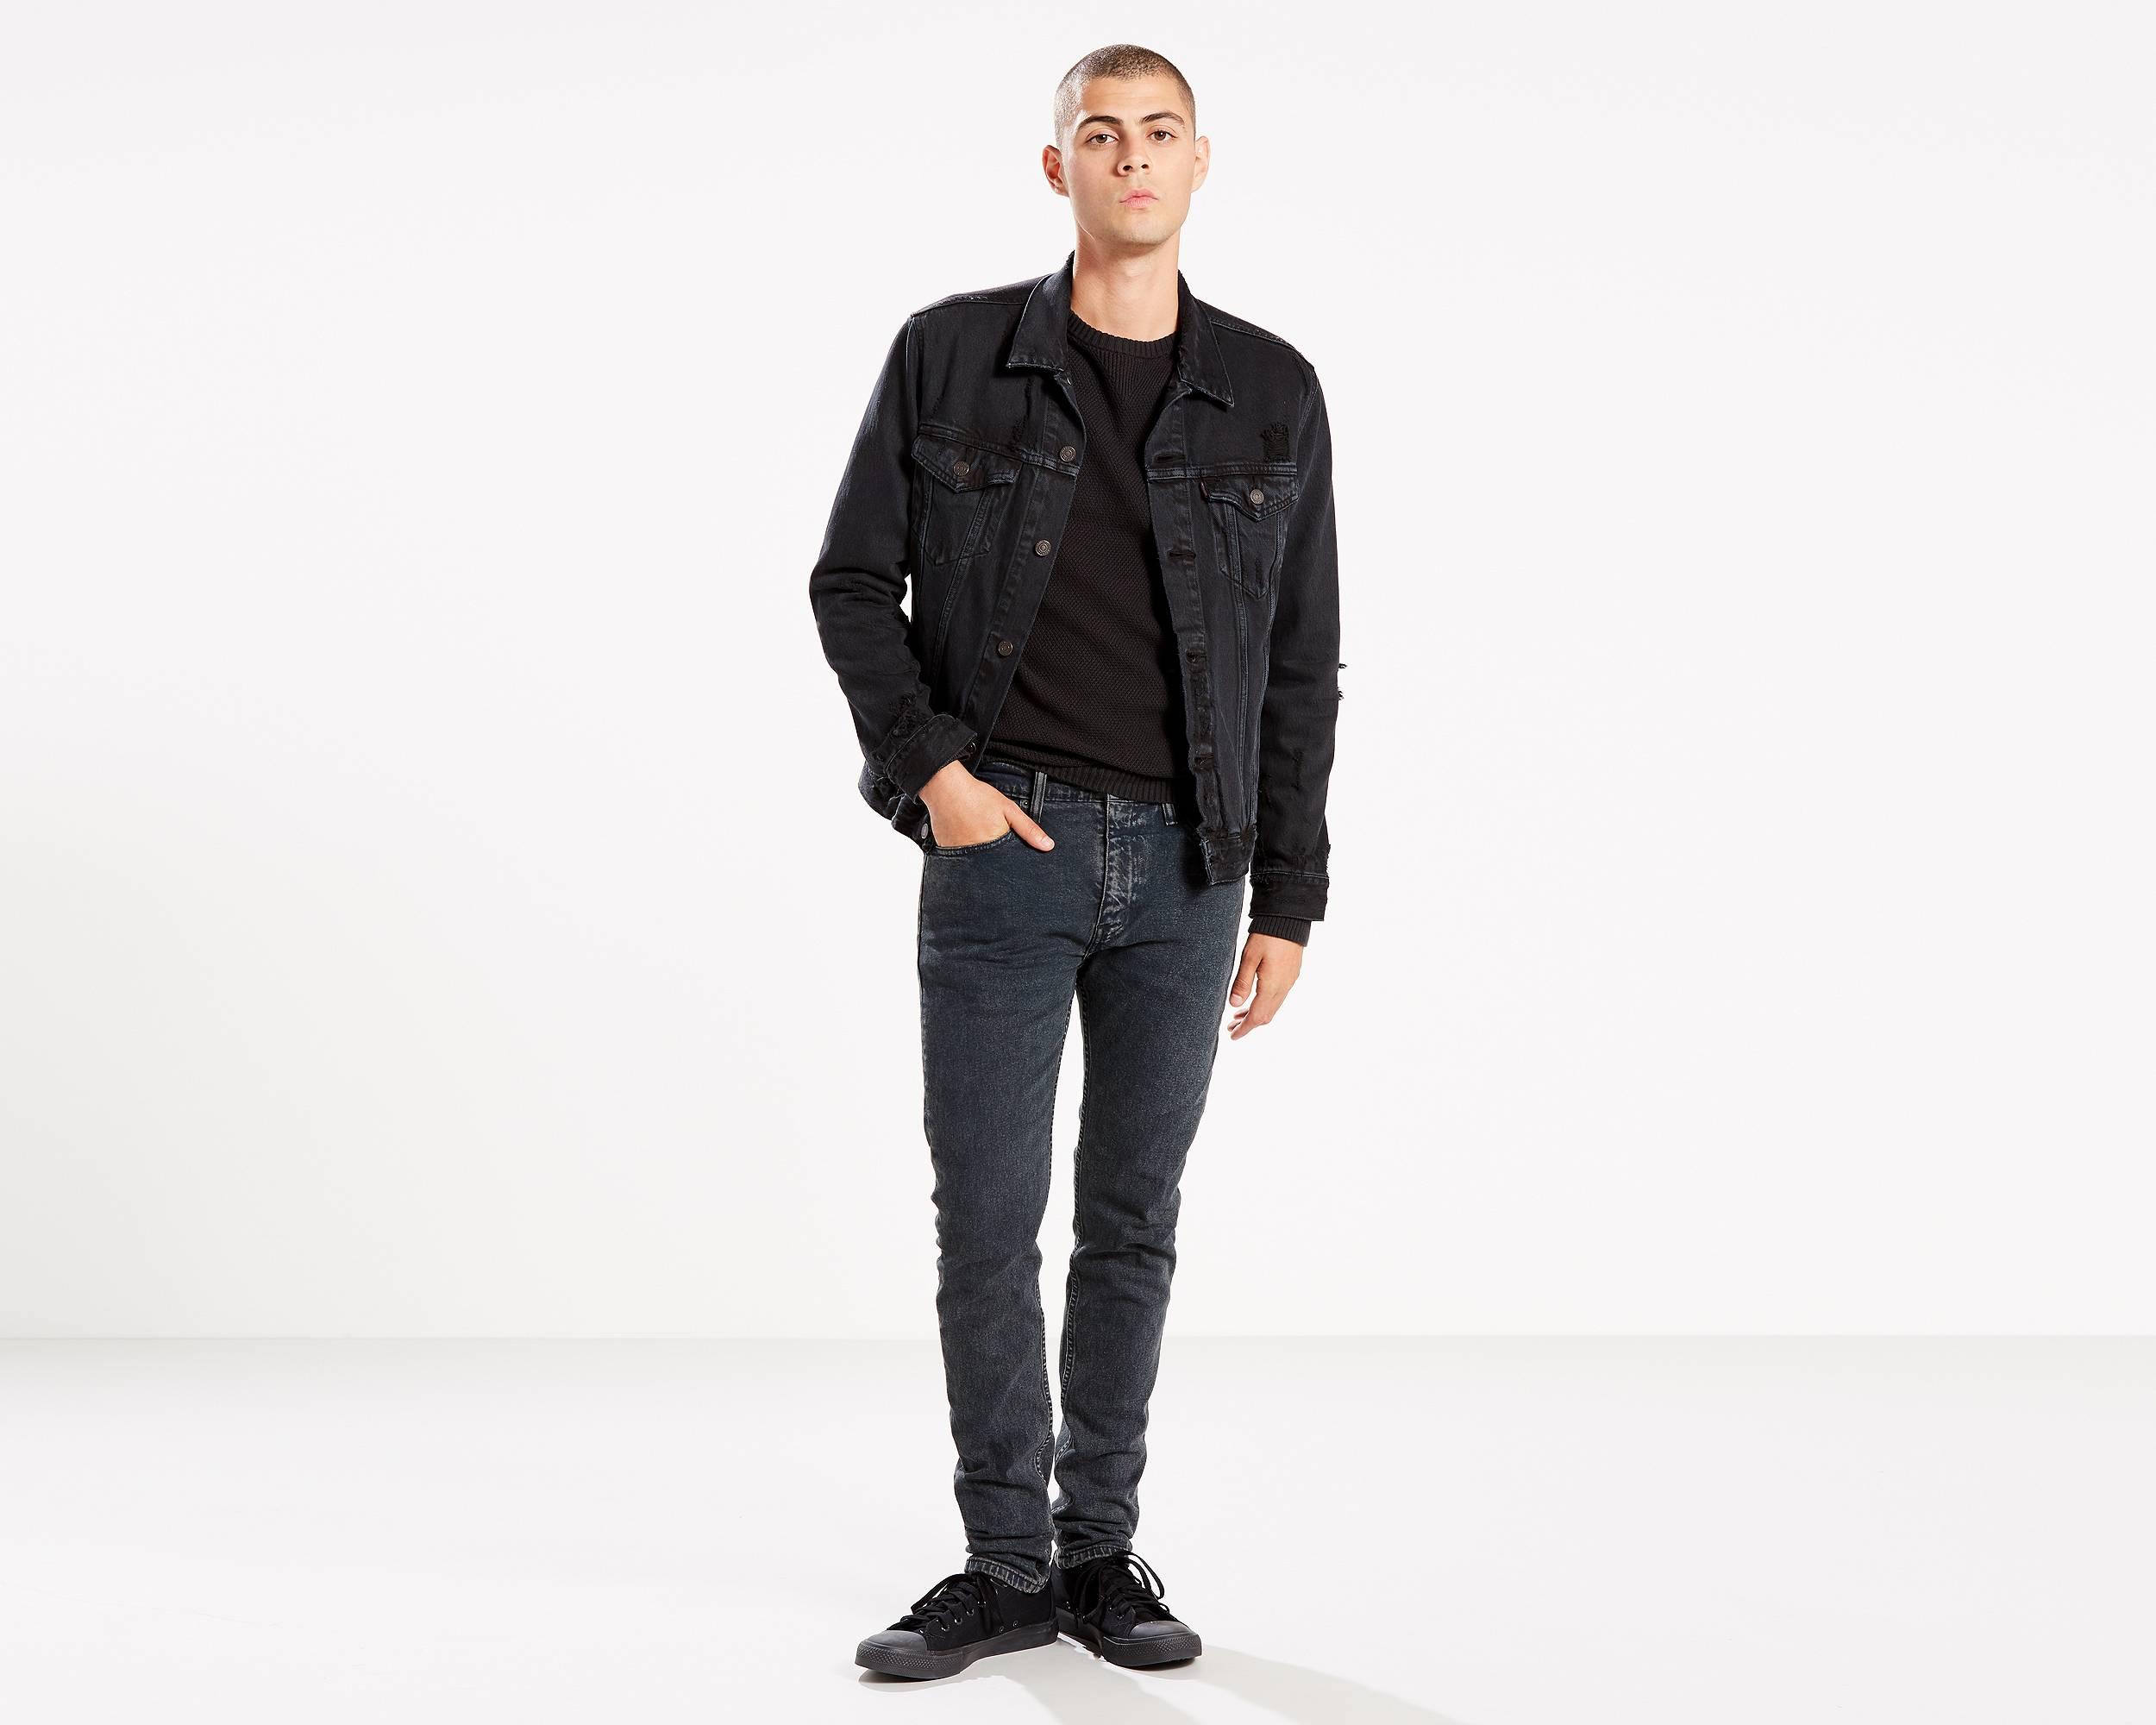 Skinny Jeans for Men - Shop Men's Skinny Jeans   Levi's®